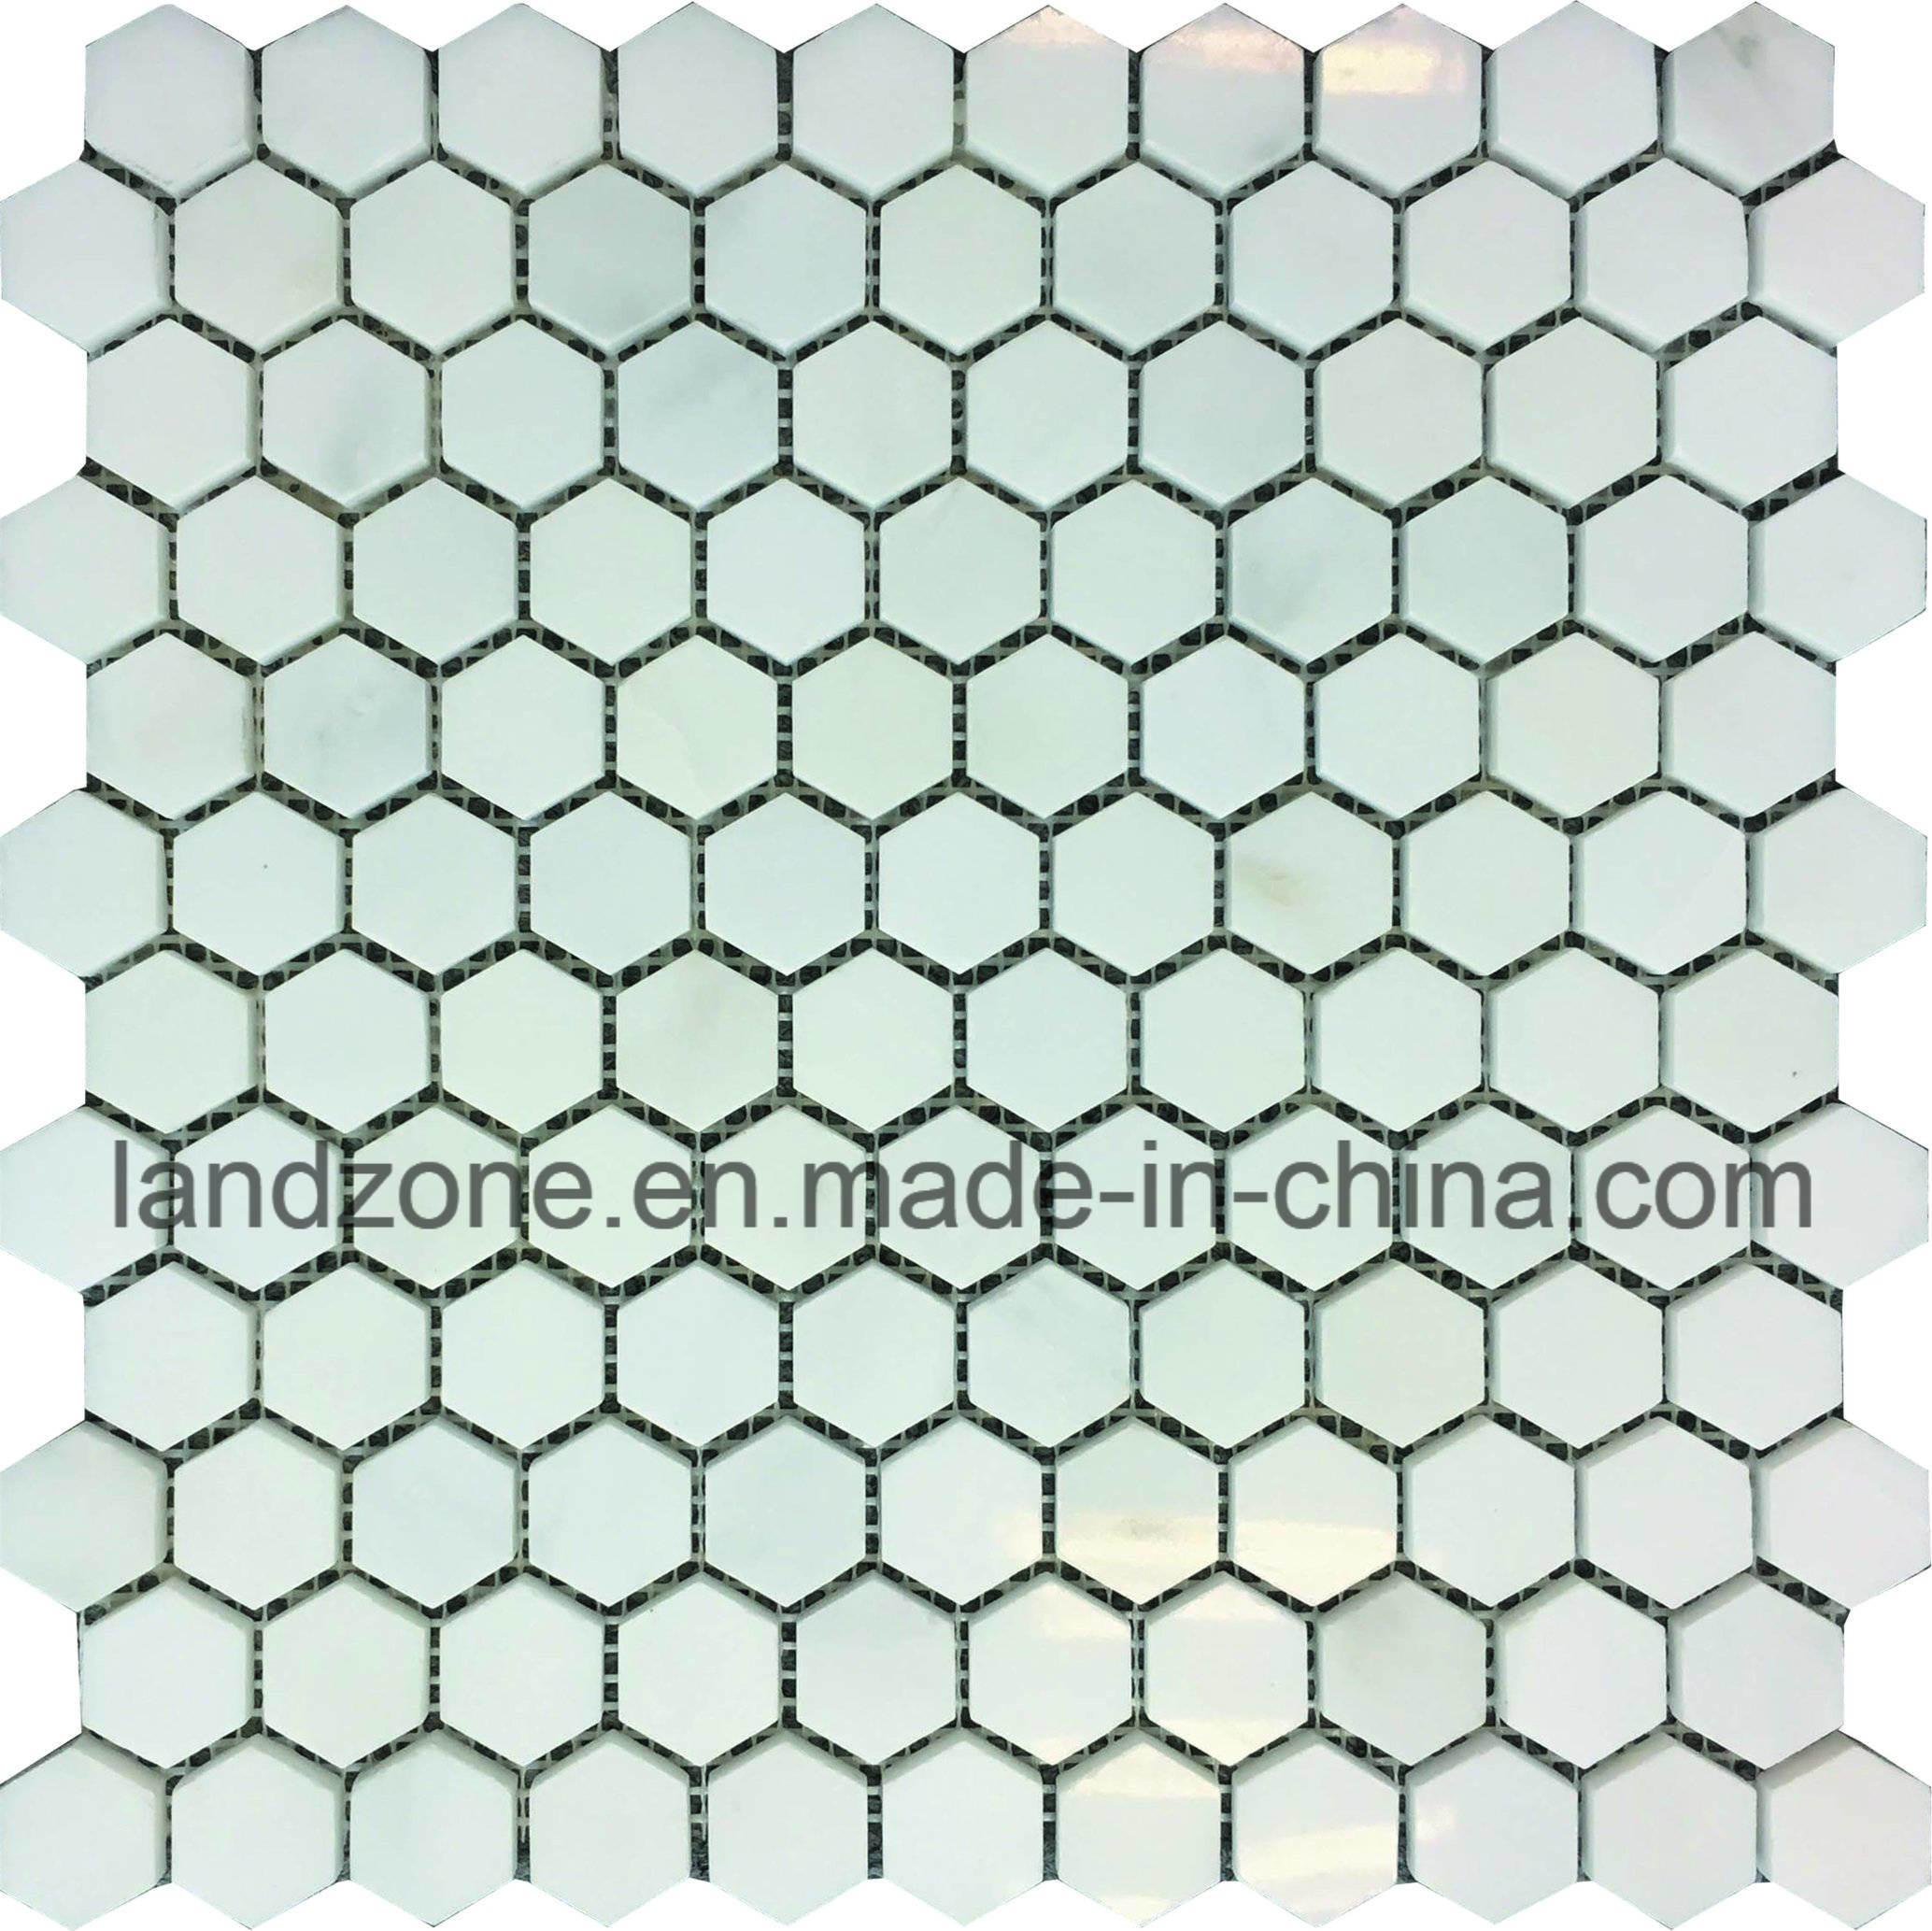 China Hexagon Bianco Carrara White Marble Mosaic Tile for Bathroom ...